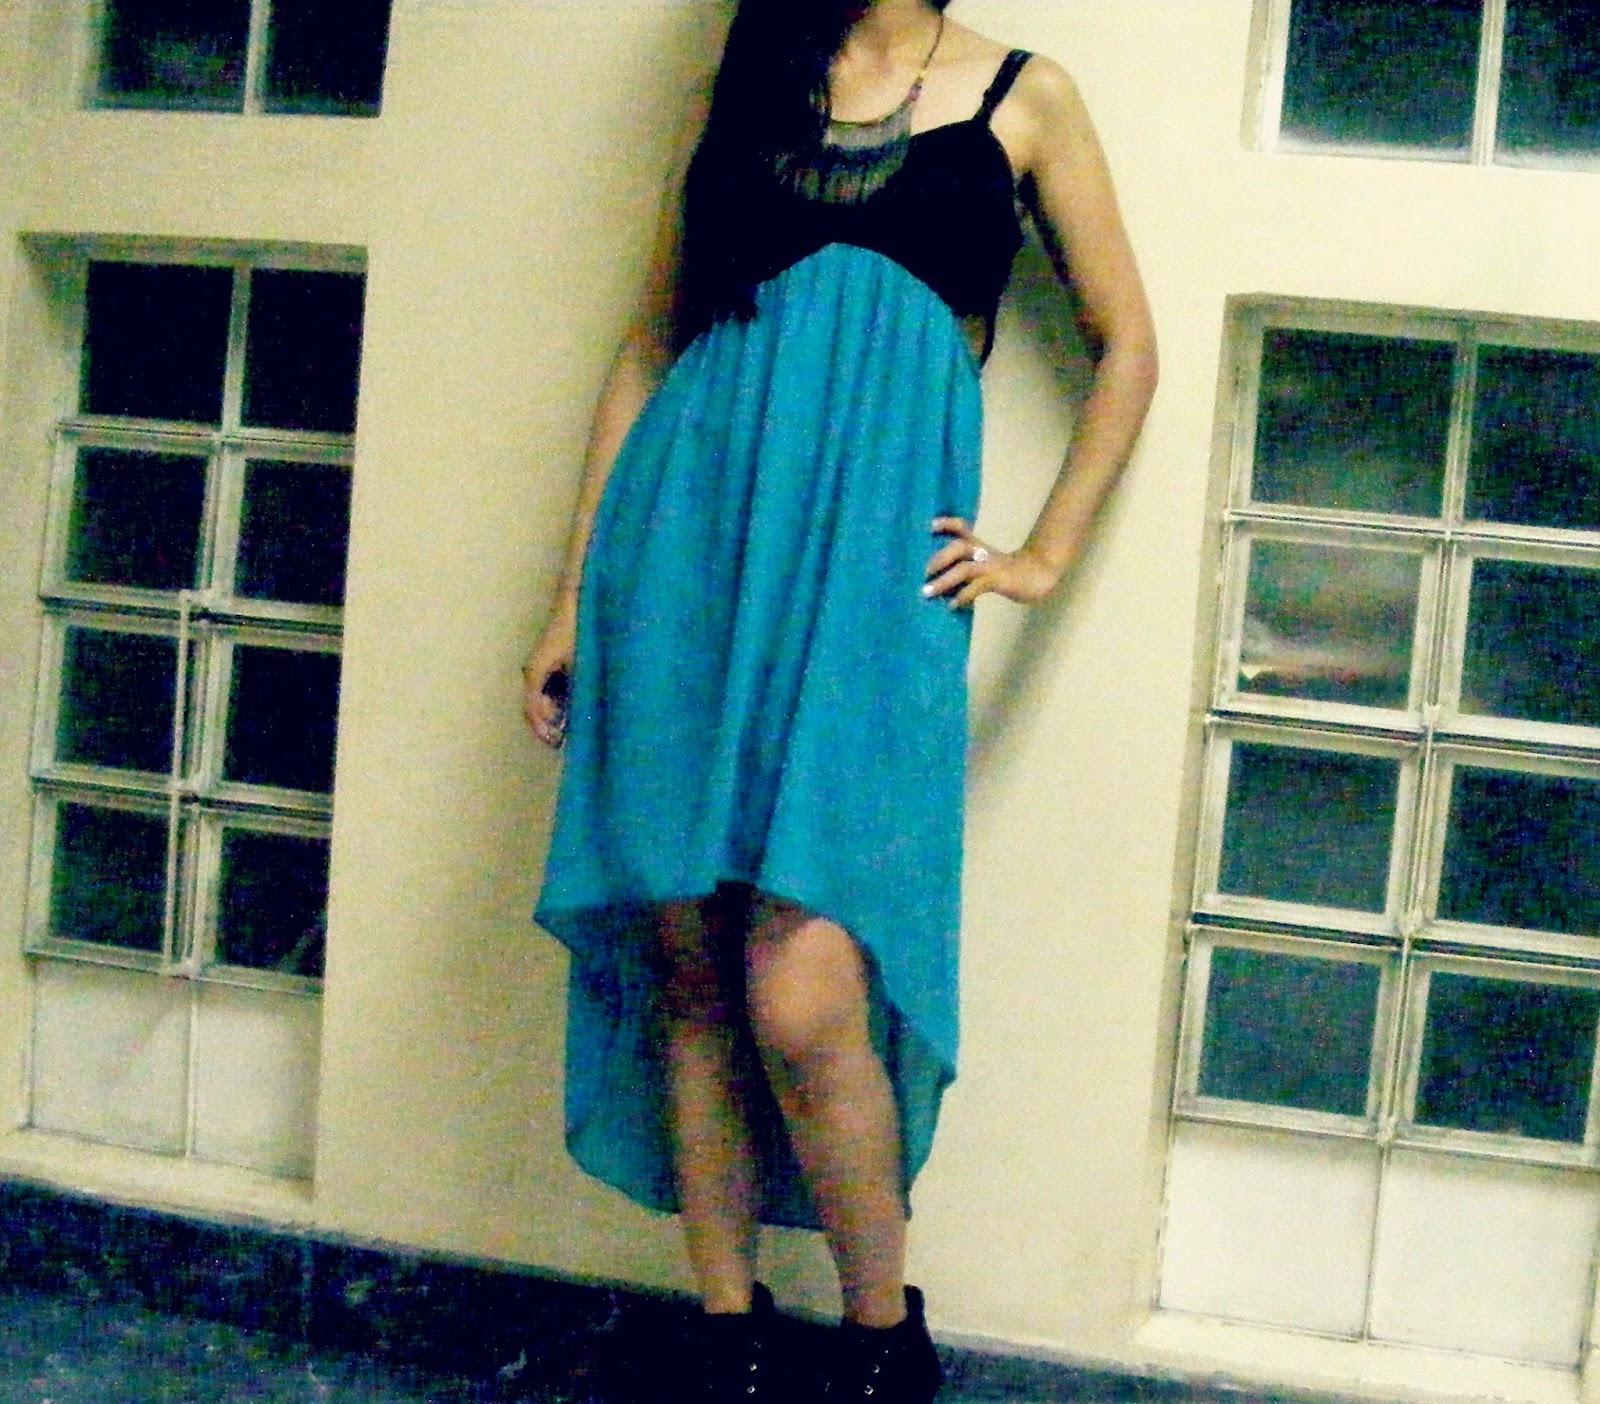 http://outfitdeldia.blogspot.com/2014/11/vestido-asimetrico-corto-y-largo.html